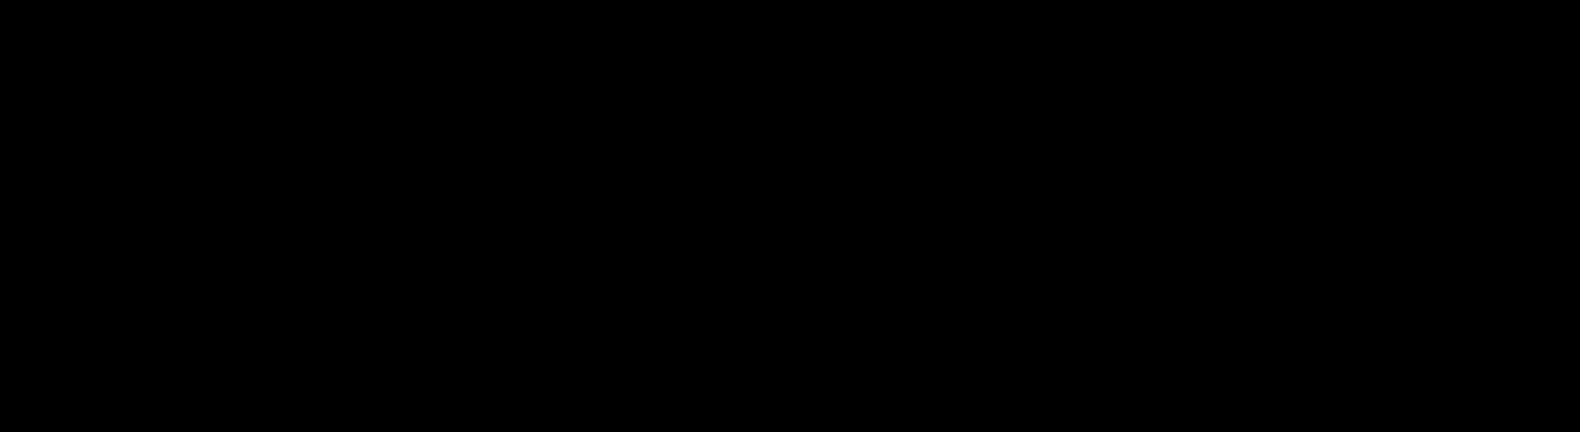 Logo Bipolart